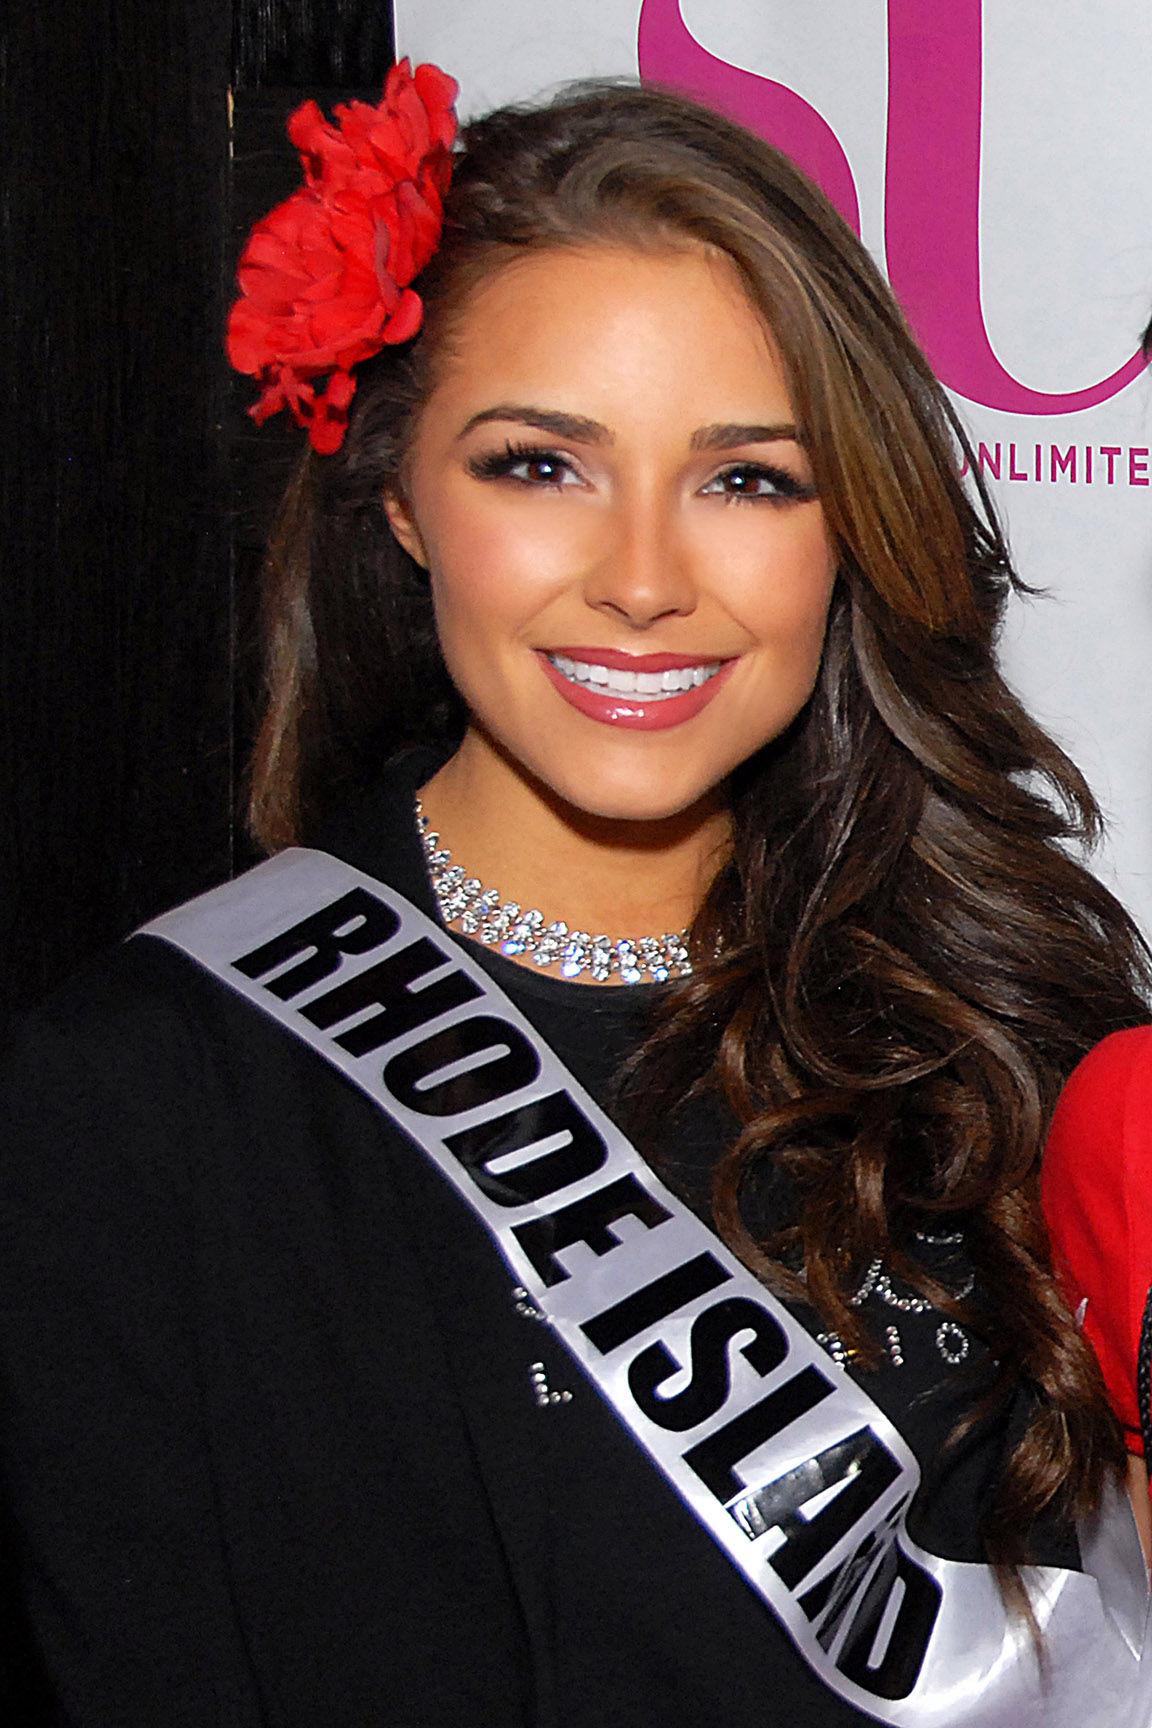 Photo of Olivia Culpo: Miss Universe 2012 winner